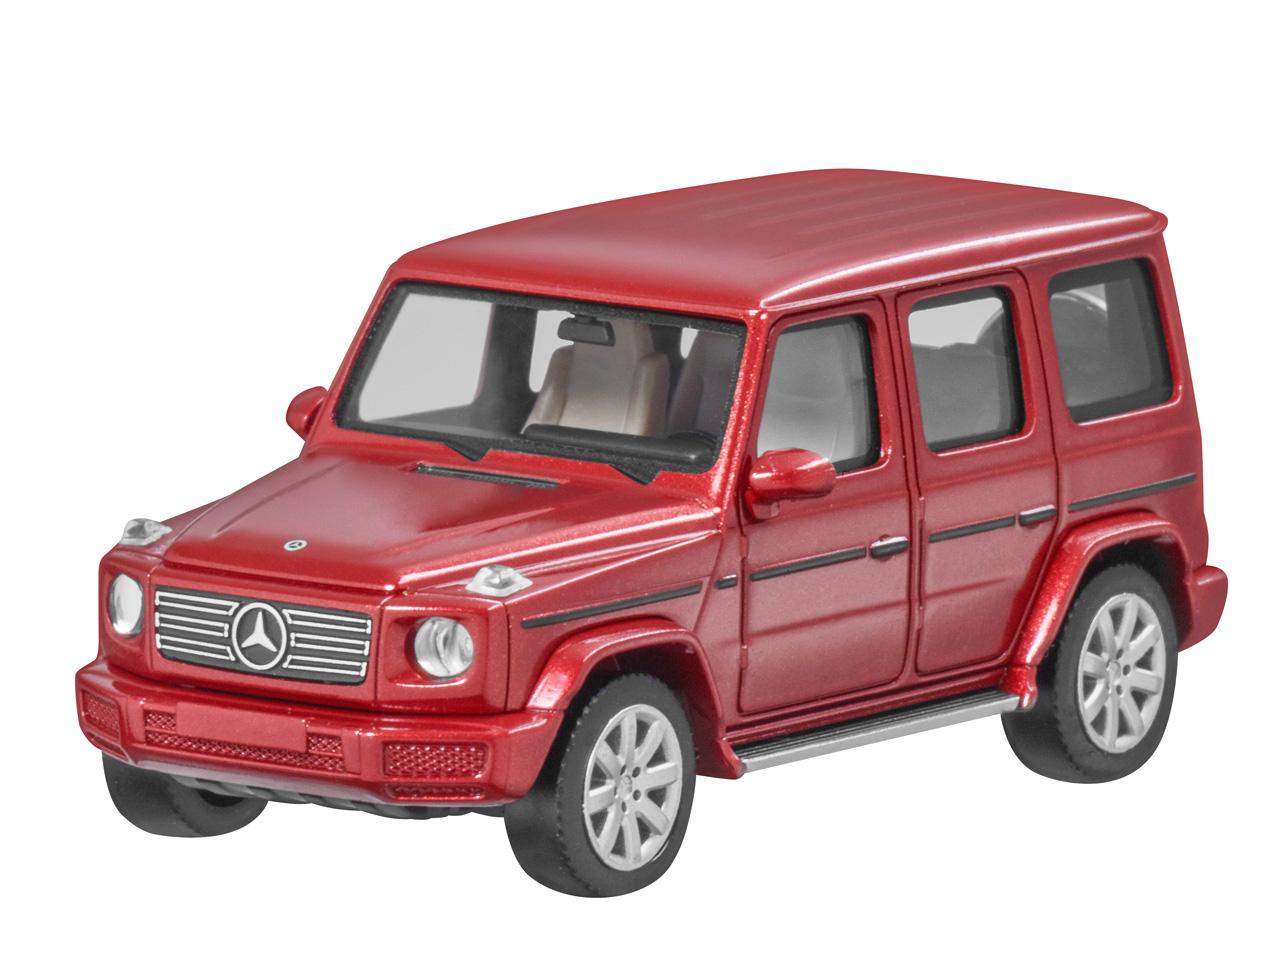 Original Mercedes-Benz G-Klasse hyazinthrot metallic 1:87 limitiert